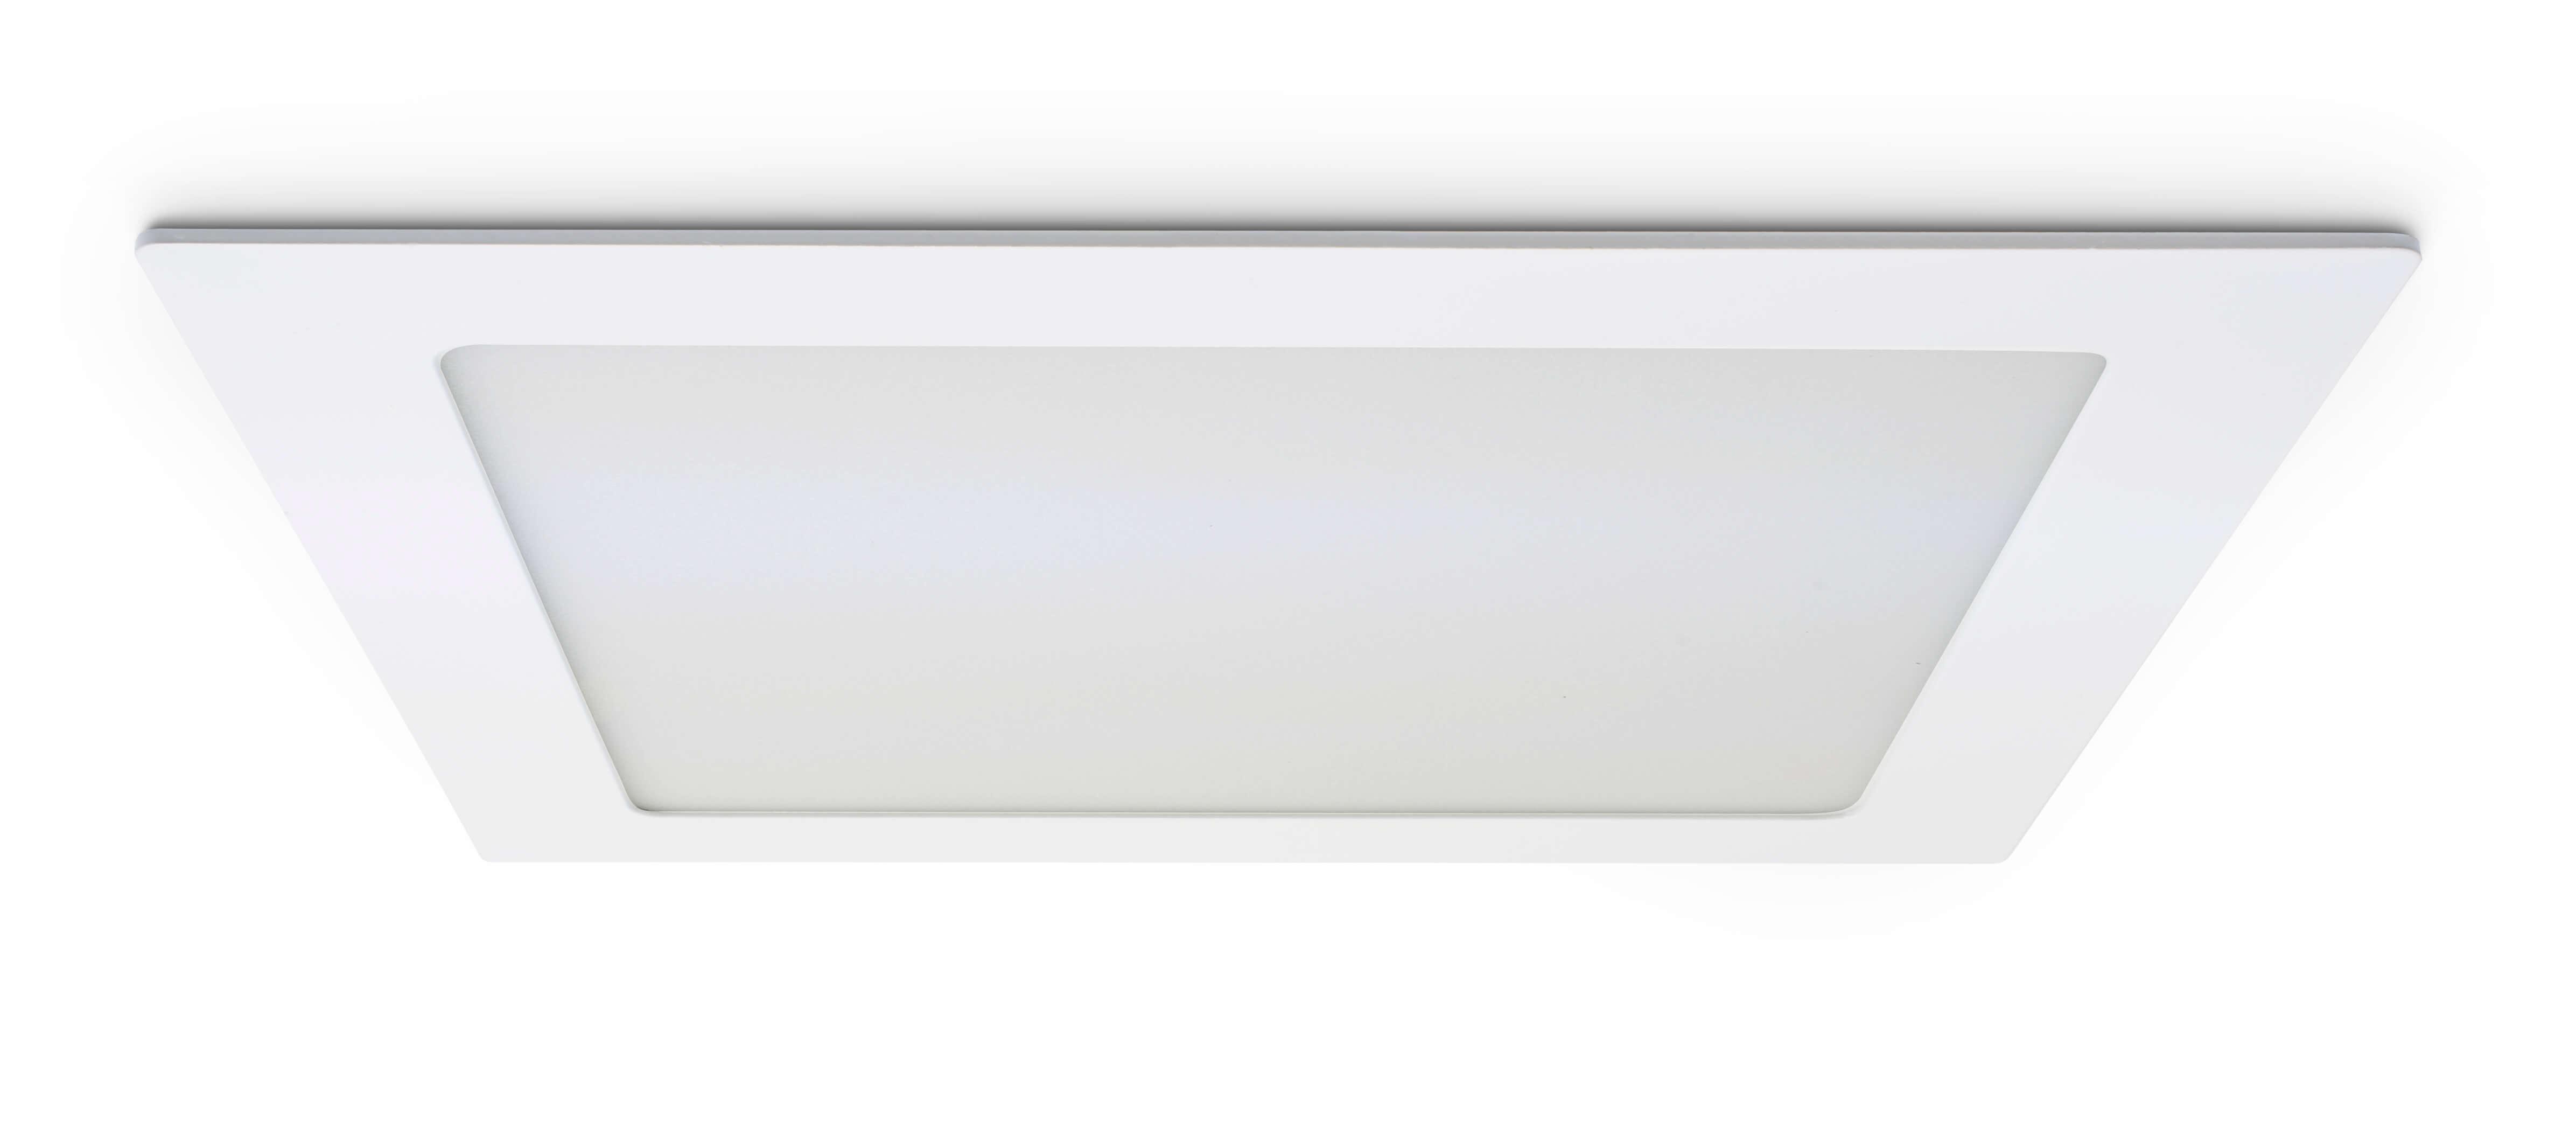 /l/e/led_panel-18w-22_5cm-quadratisch-unterputz-kunststoff-aus_1.jpg